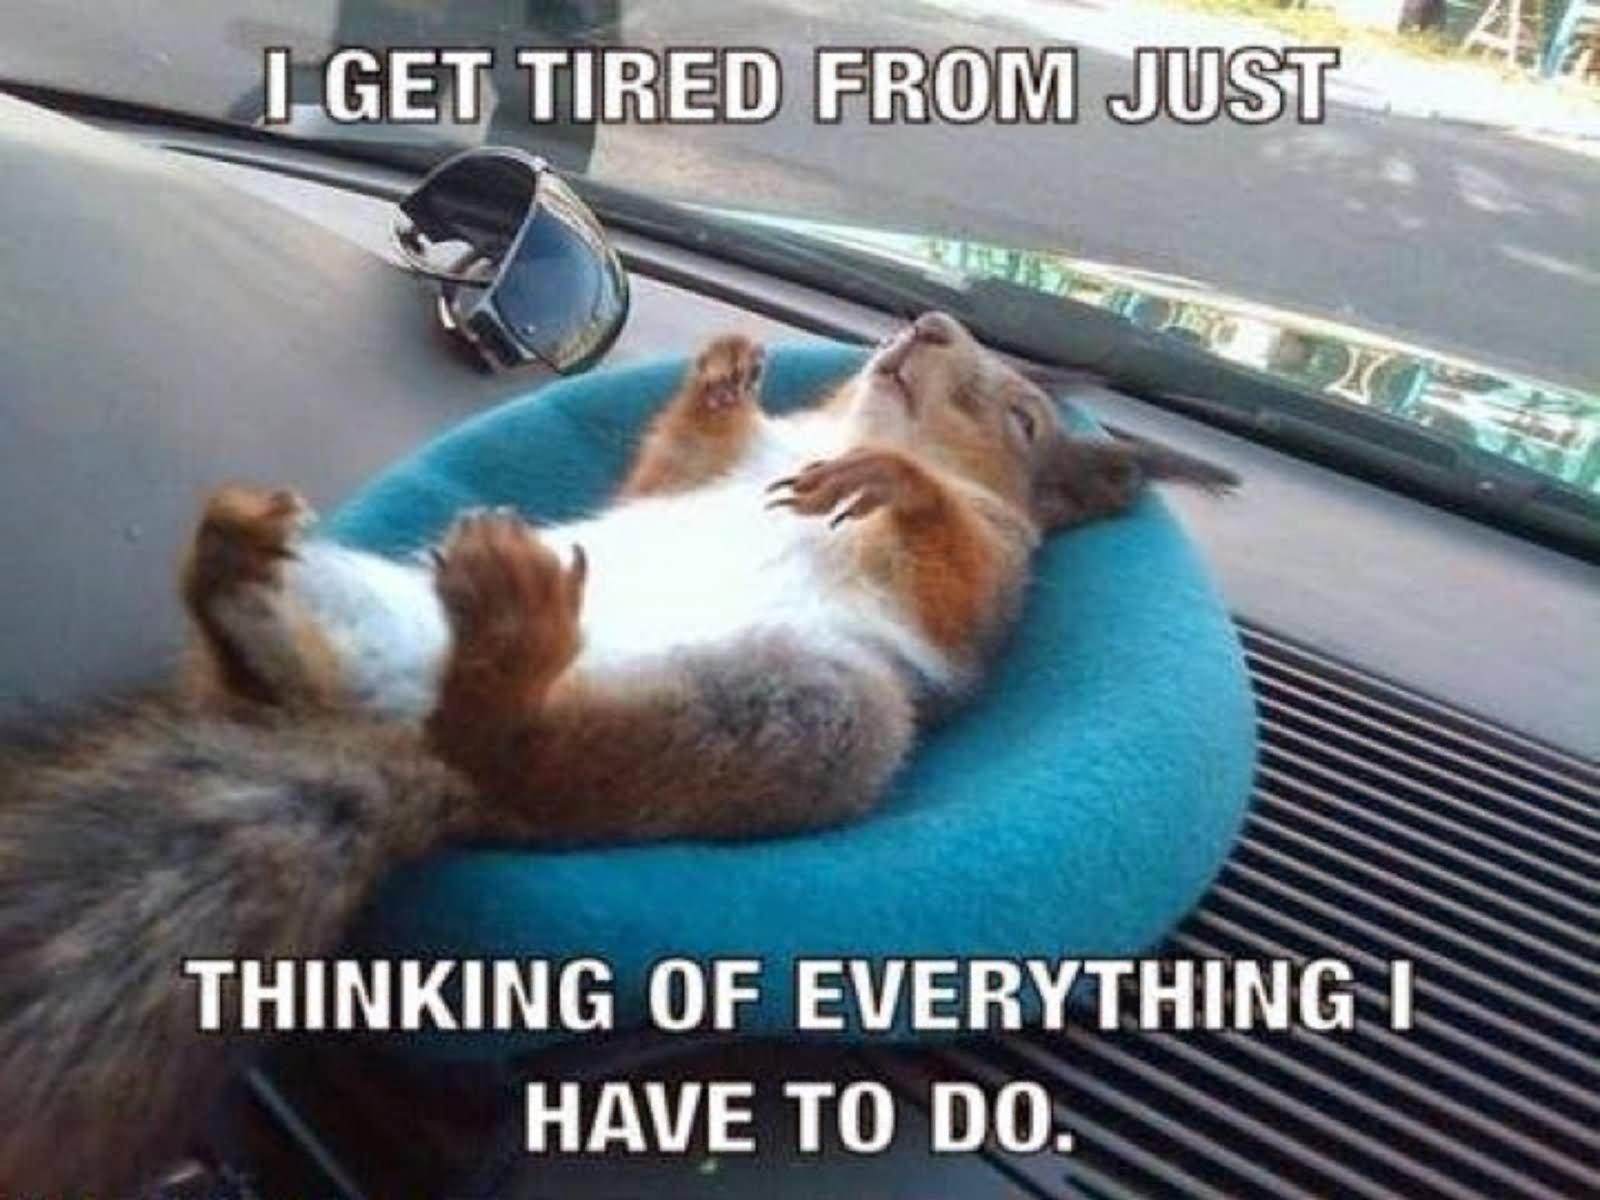 chucklesome squirrel meme